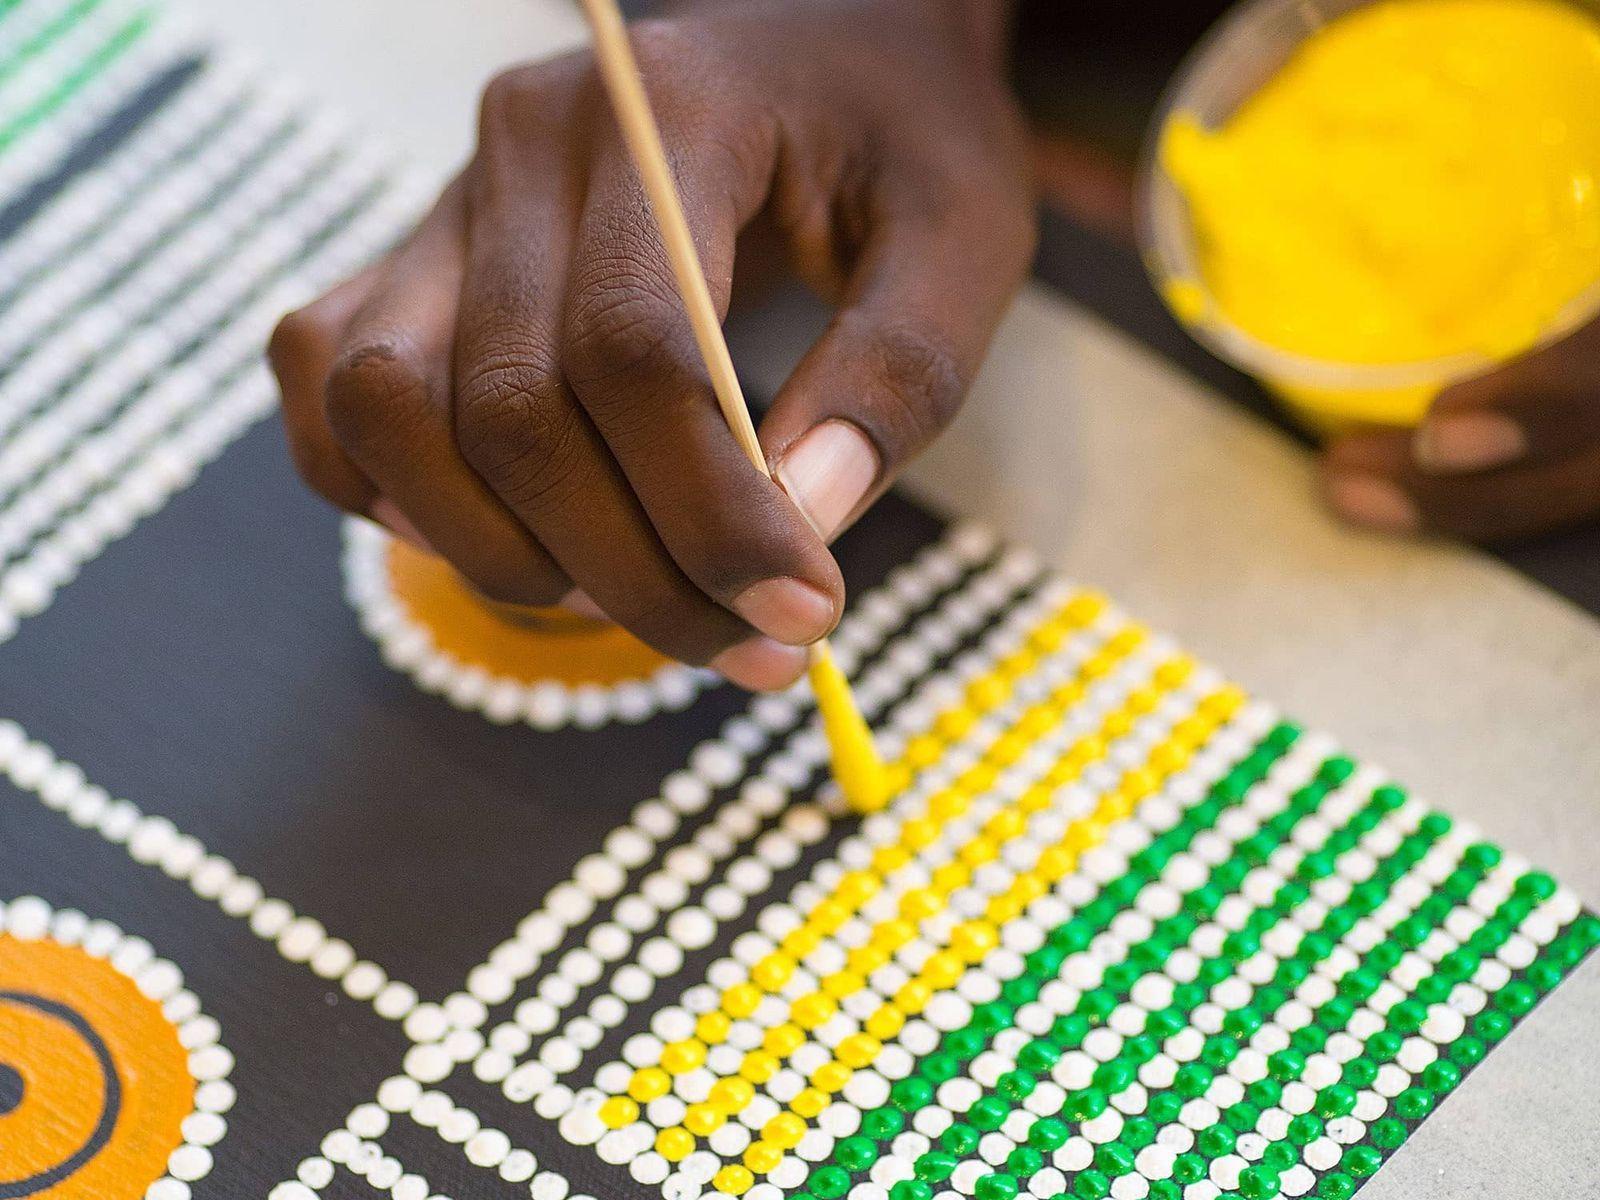 Colorful Dot Painting, Australia virtual tour